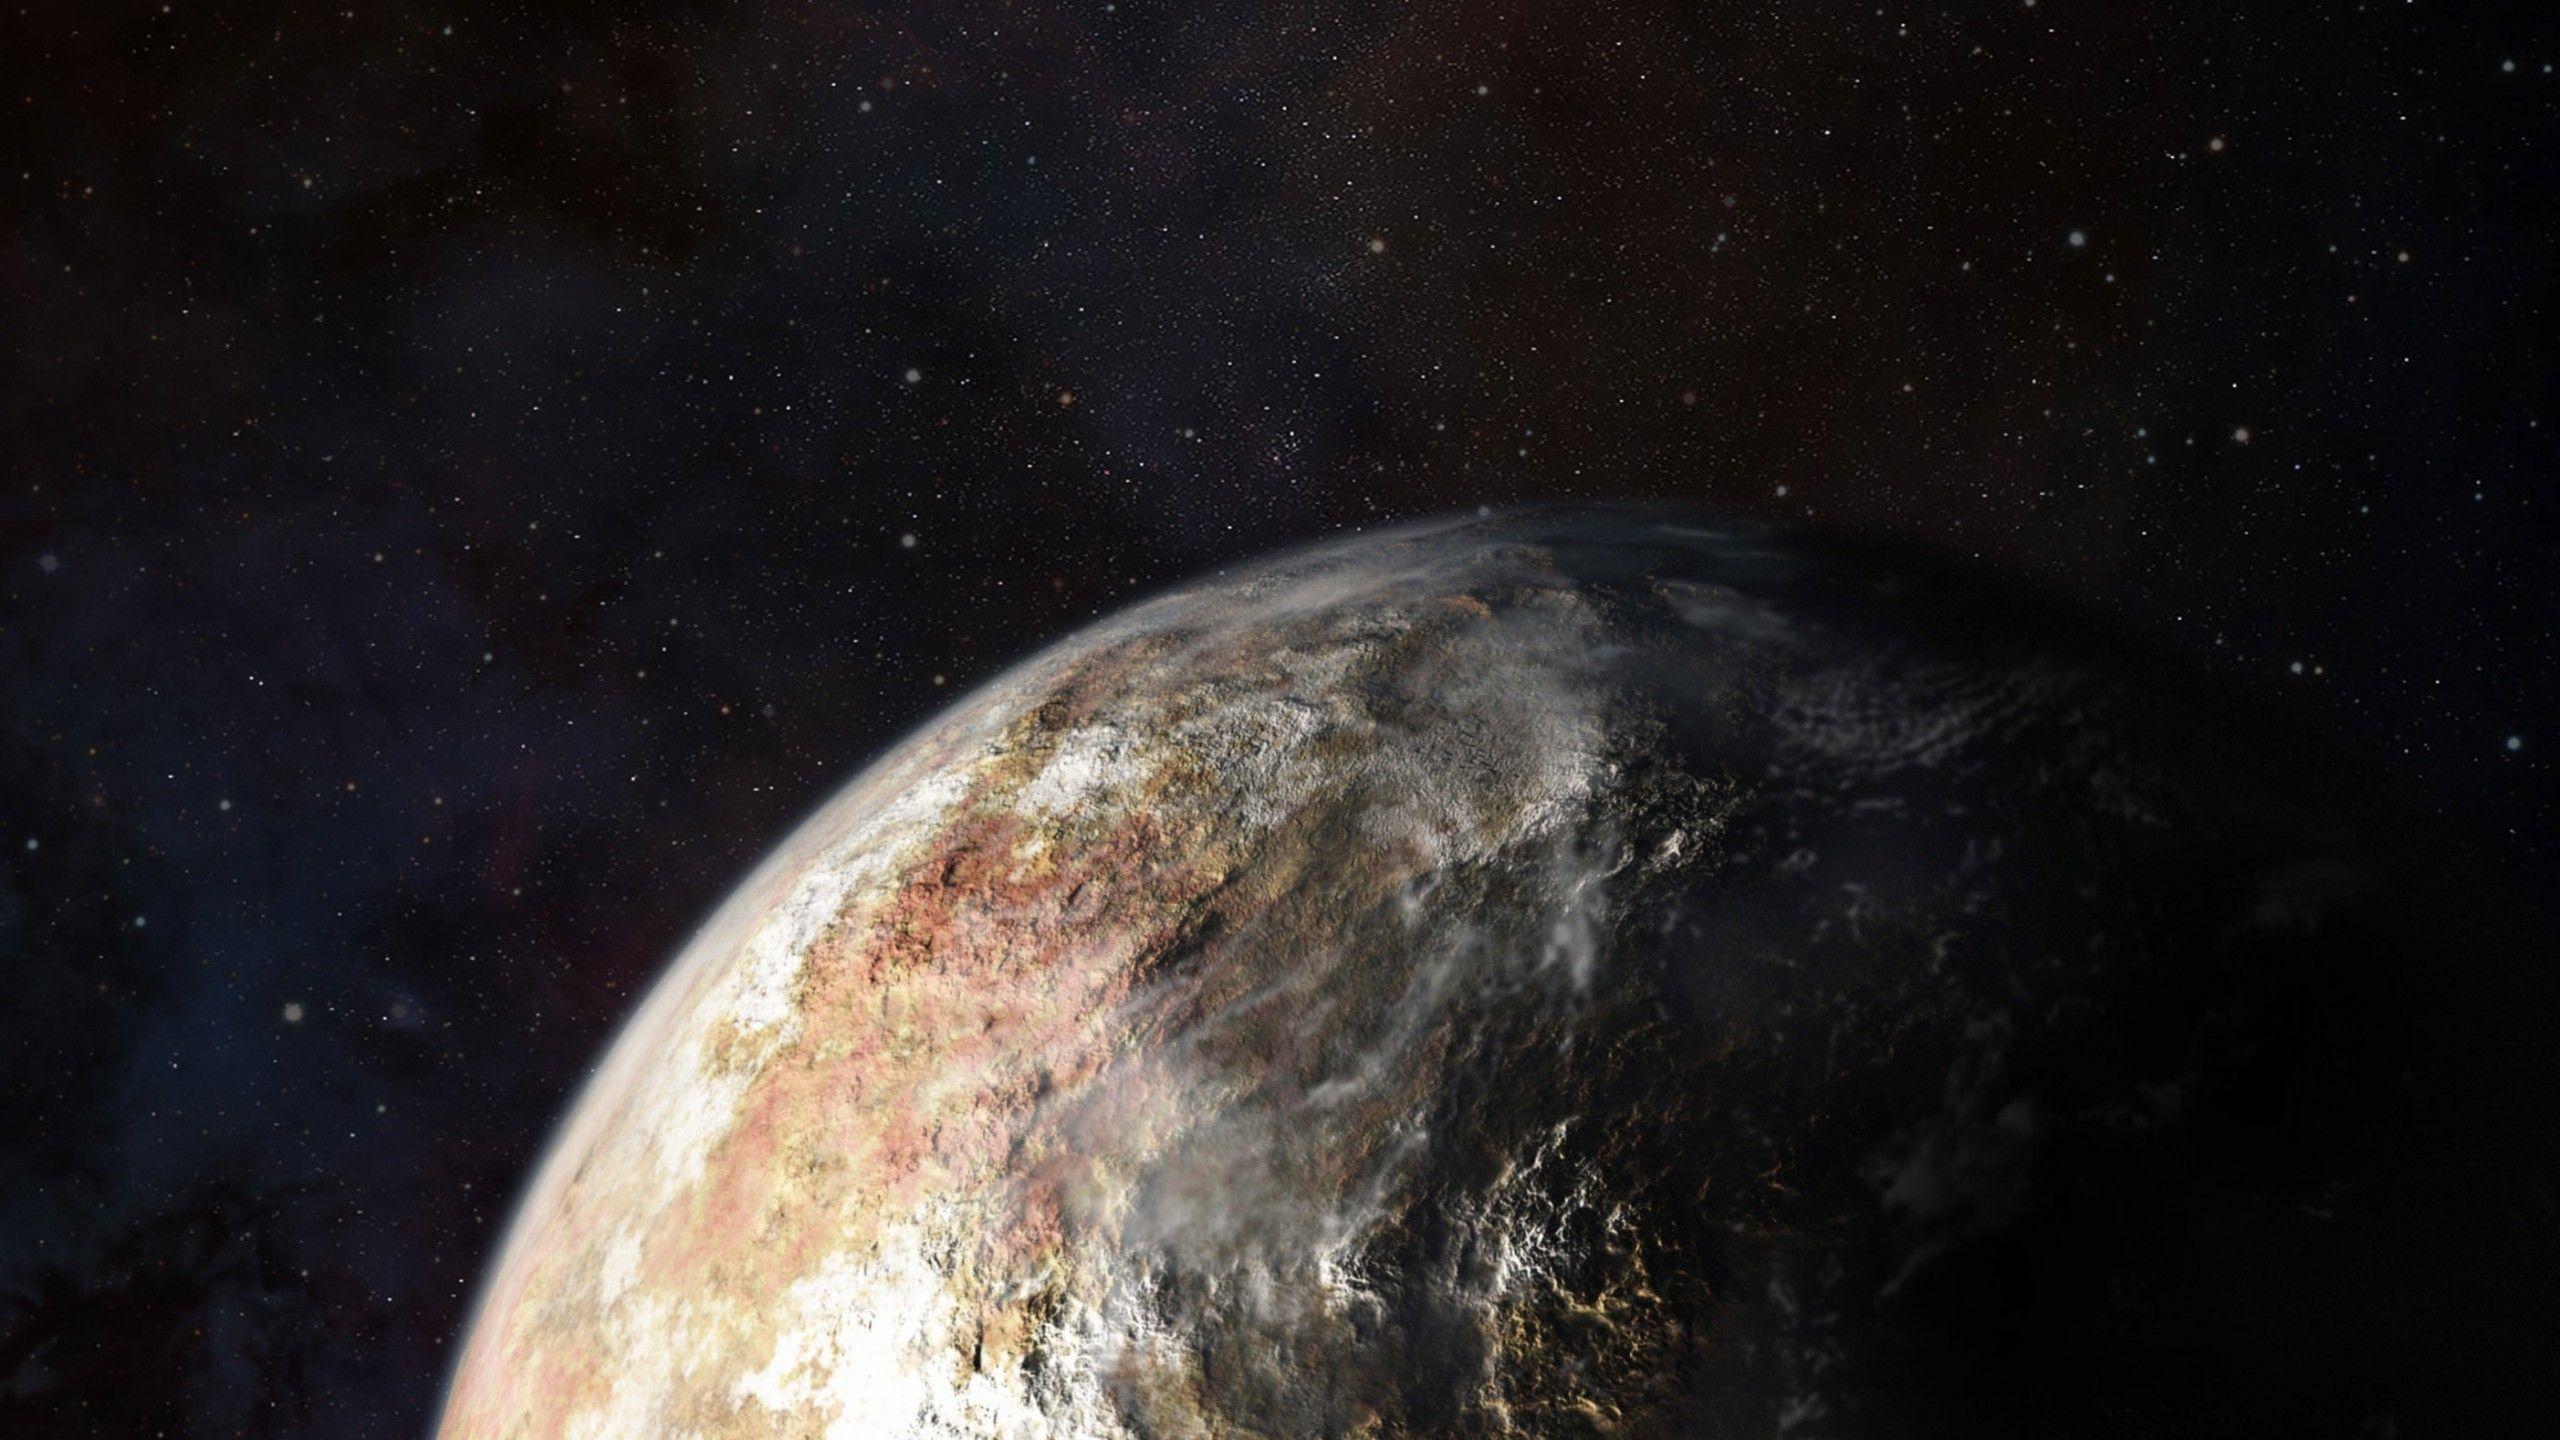 Pluto 4k Ultra Hd Wallpapers Top Free Pluto 4k Ultra Hd Backgrounds Wallpaperaccess